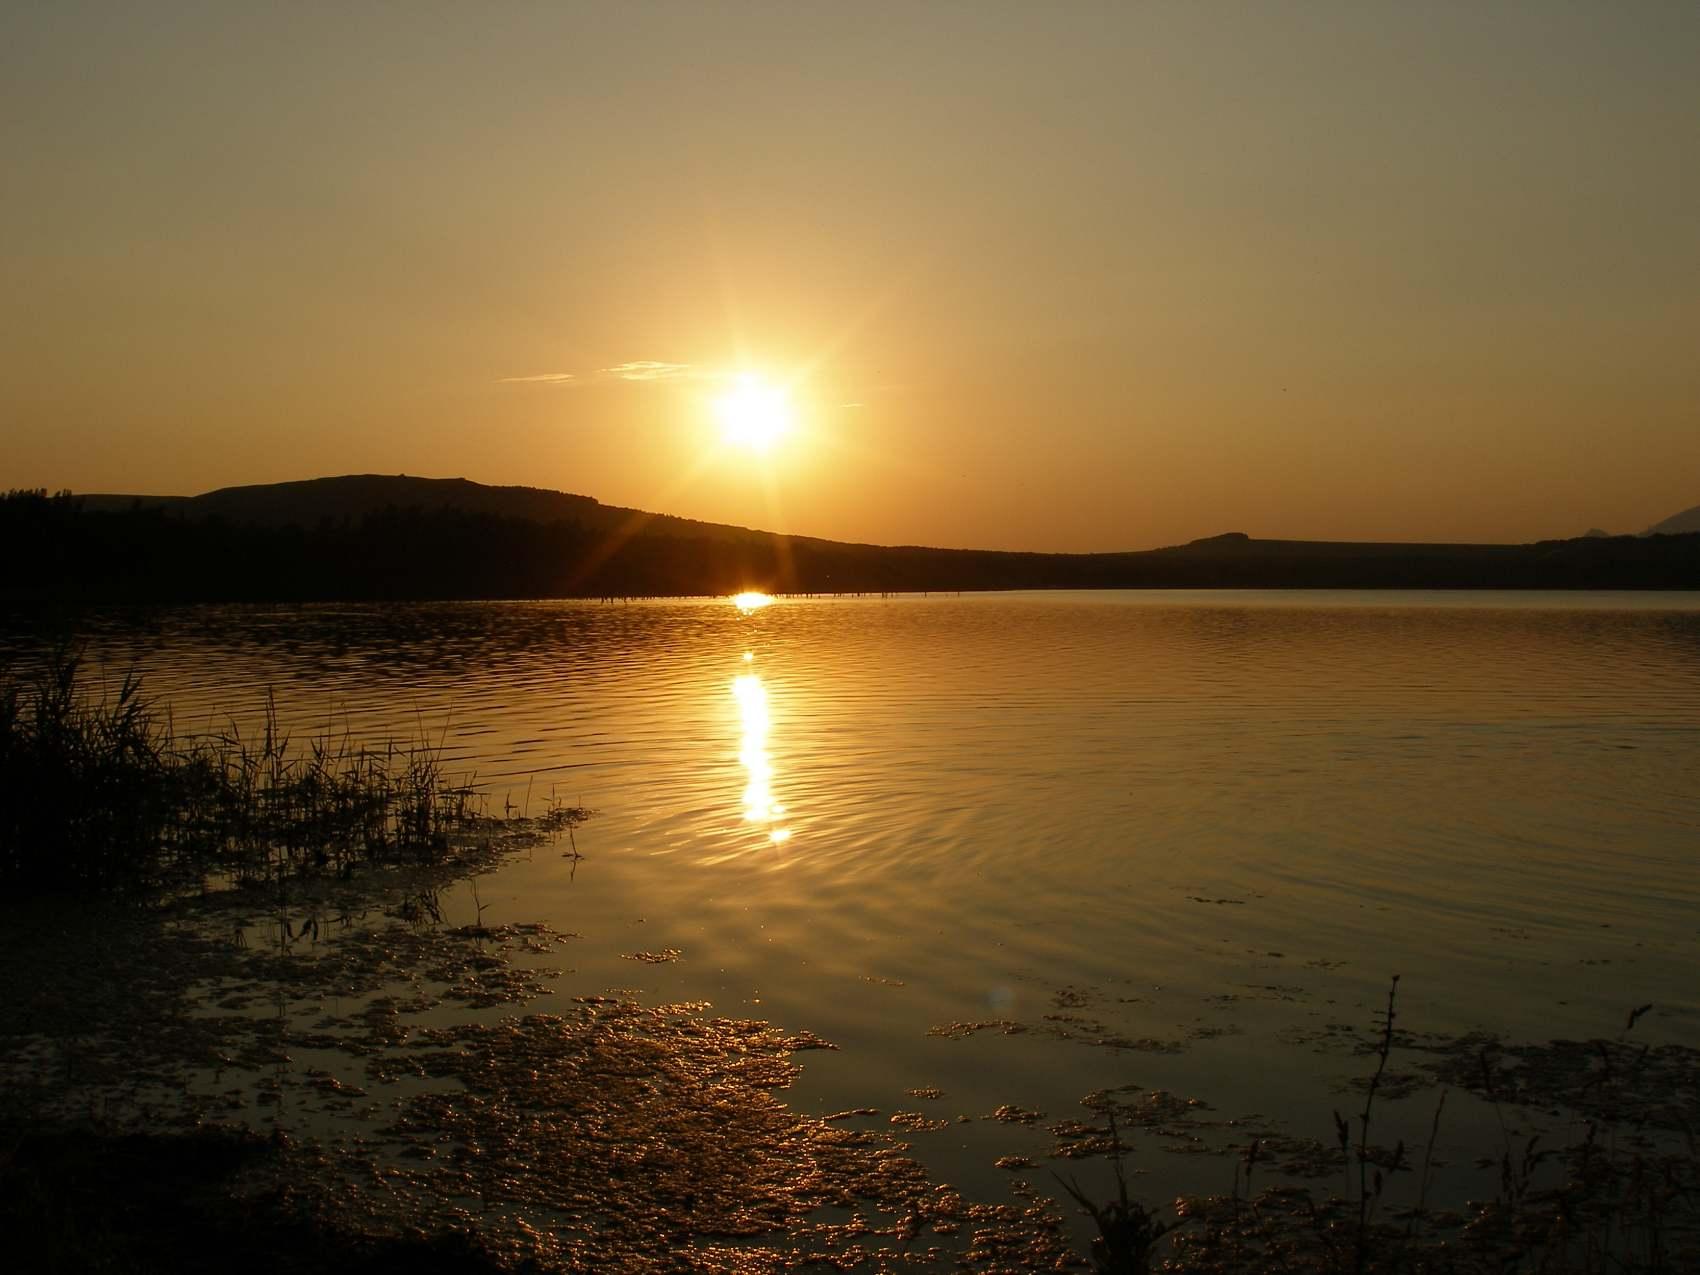 кордон озеро тамбукан фото коллекция